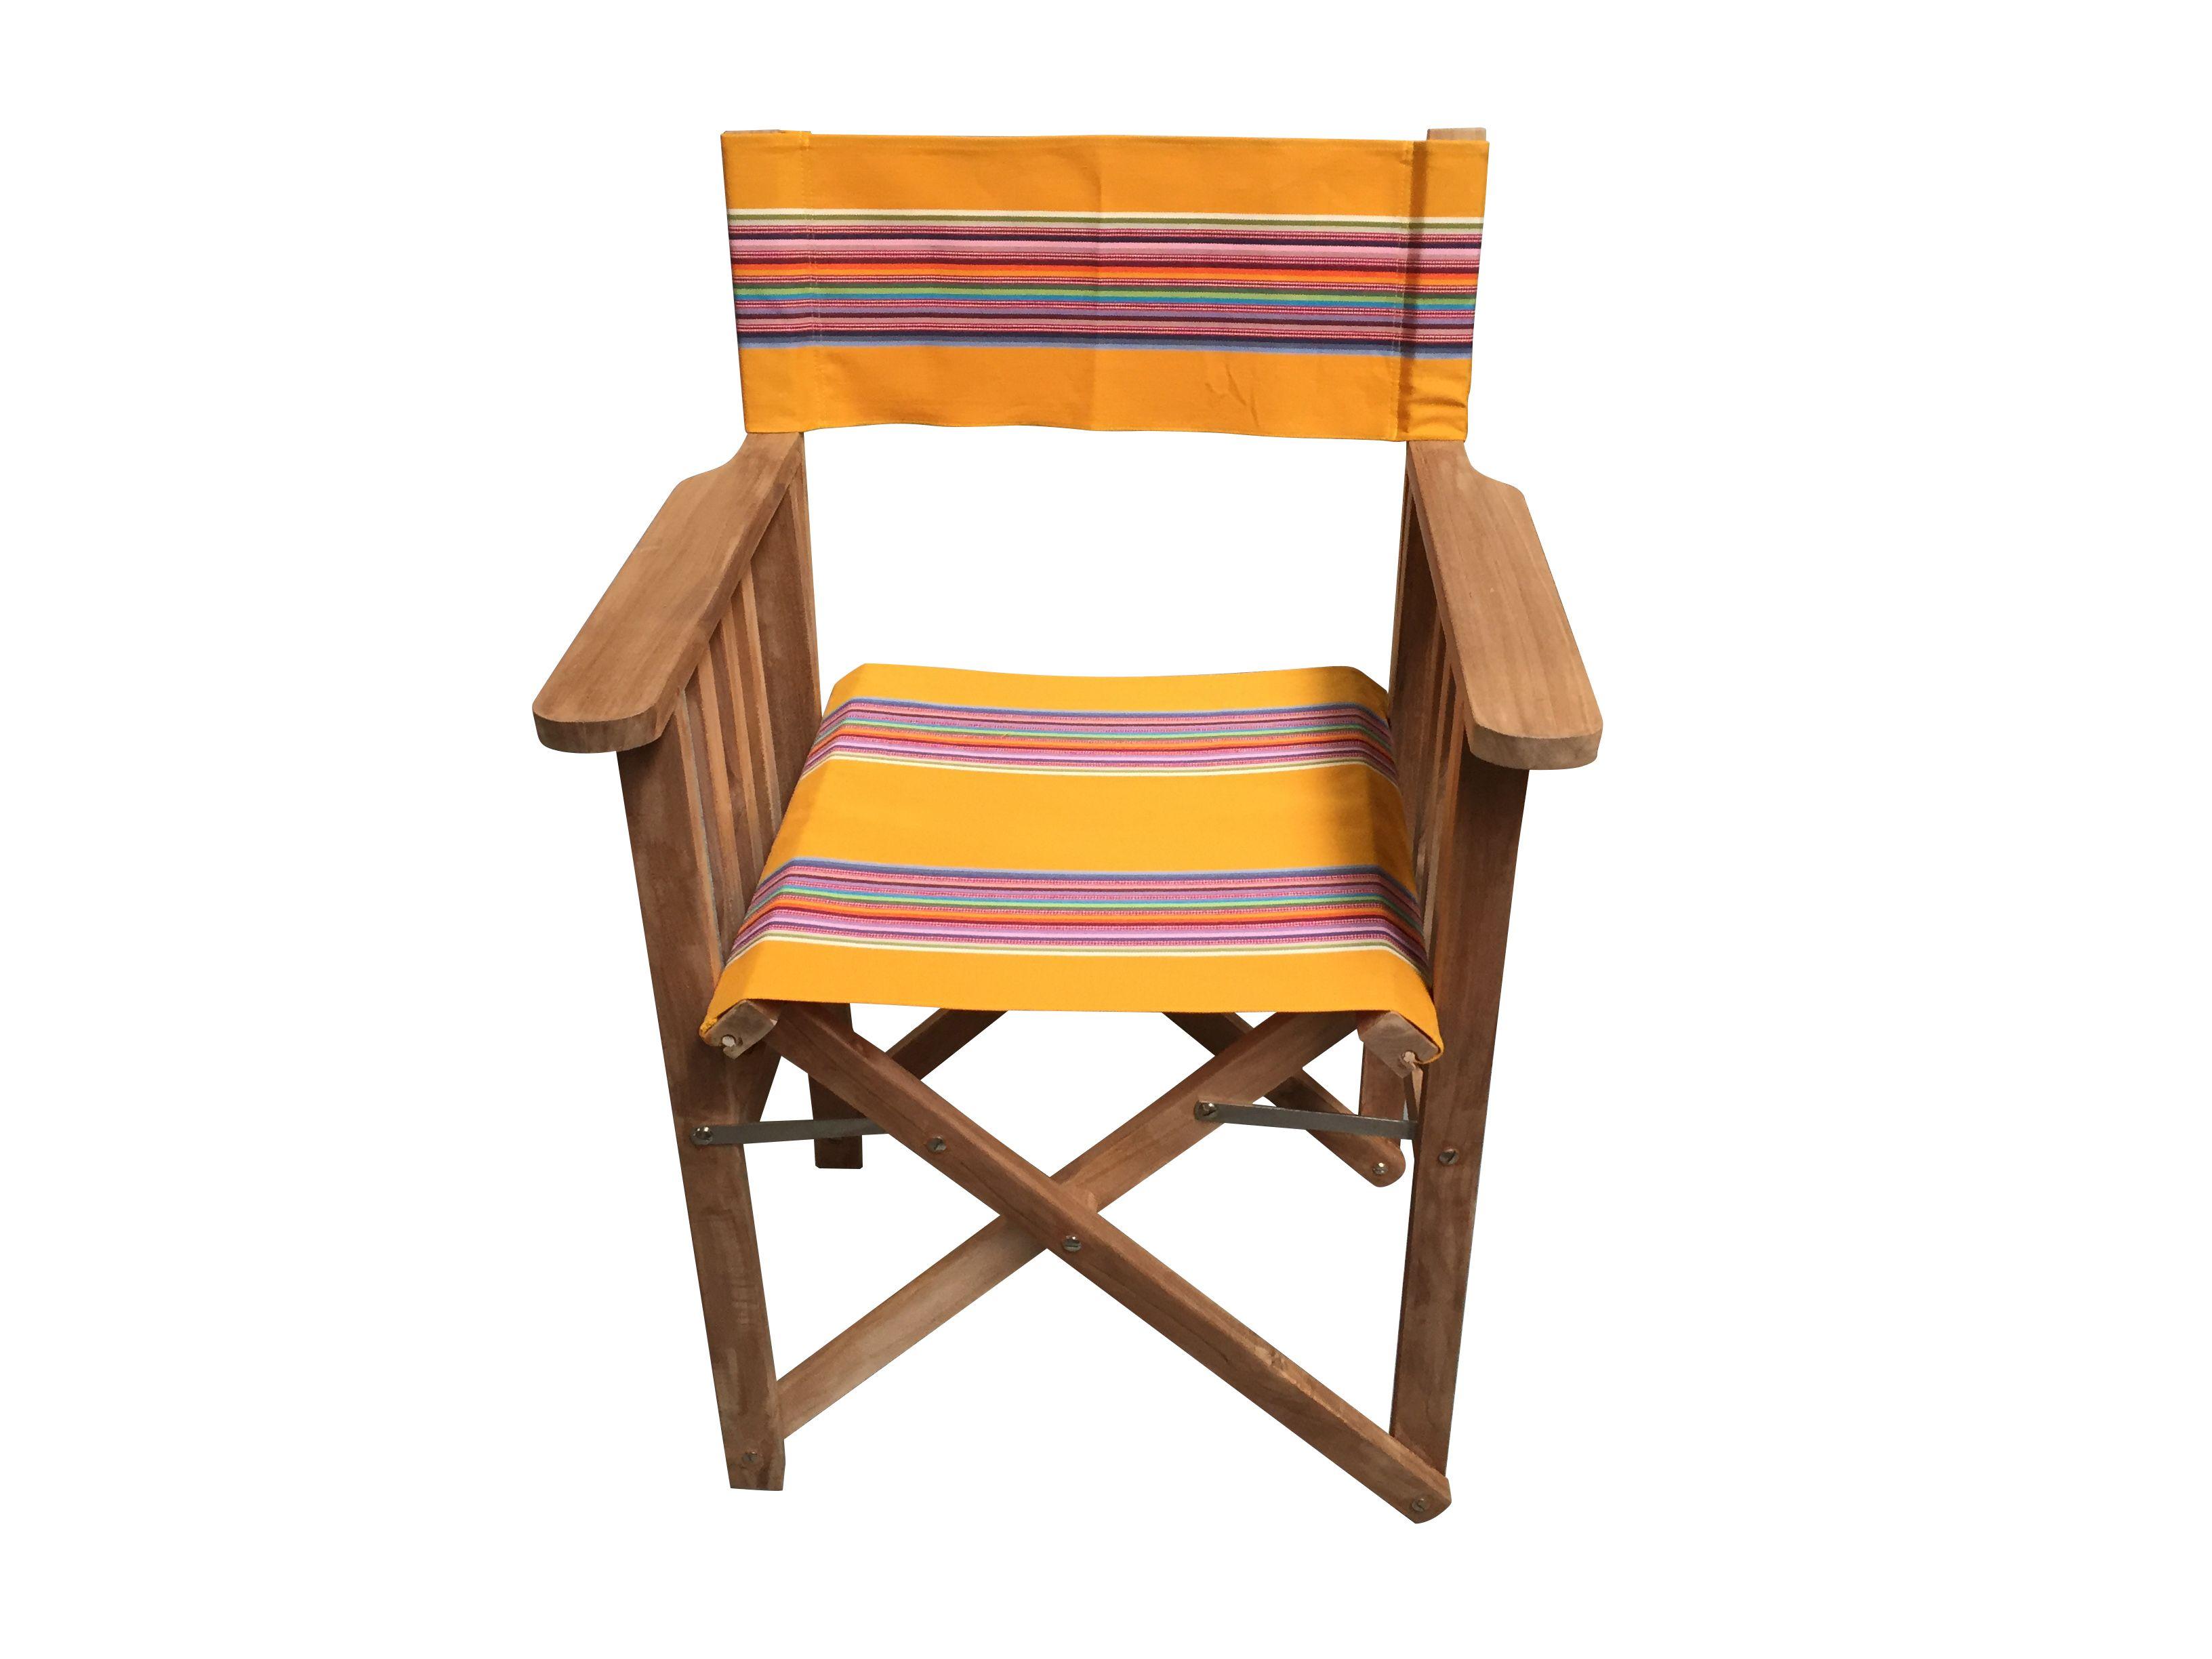 Teak Directors Chair Butterfly Yellow Stripe Chair Folding Garden Chairs Deck Chairs